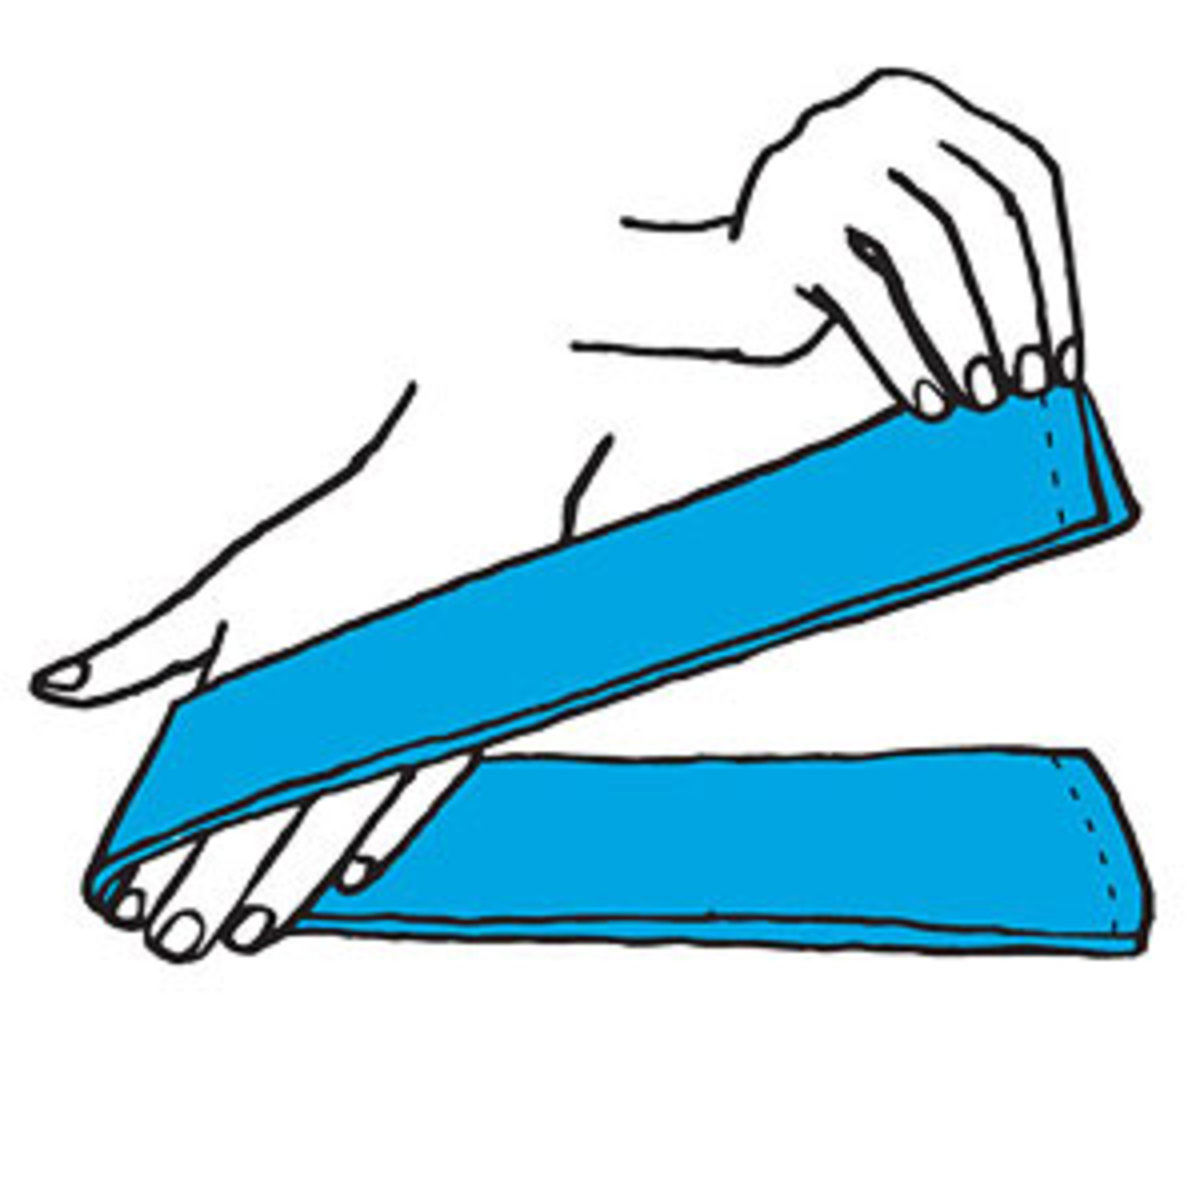 easy folds rachael. Napkin clipart folded napkin